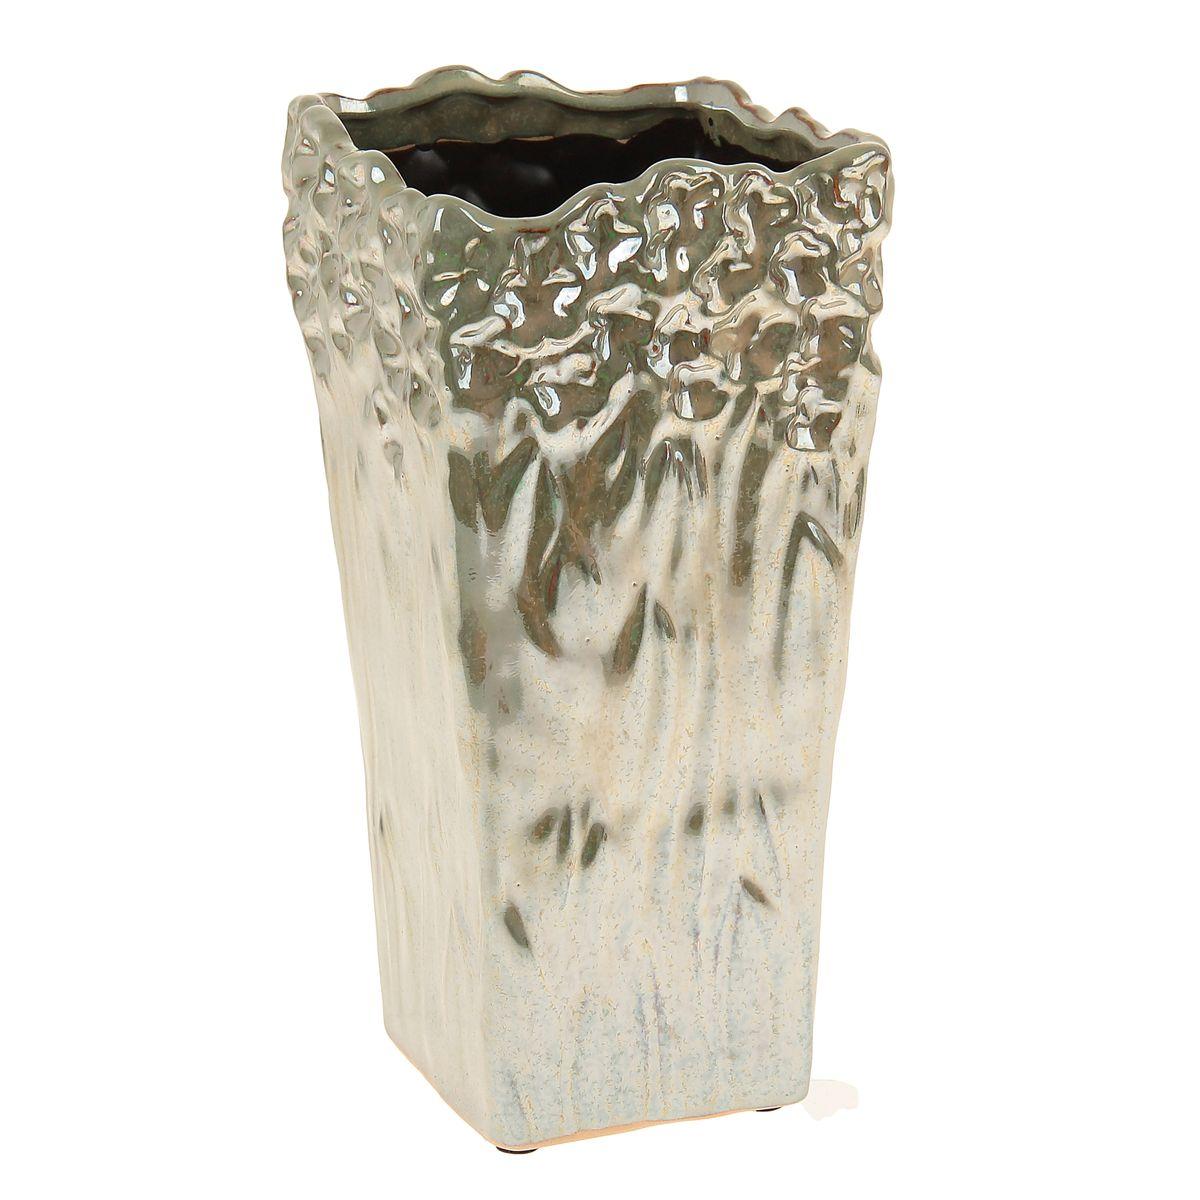 Ваза керамика перелив 23,5*12*12 см 863614863614Керамика